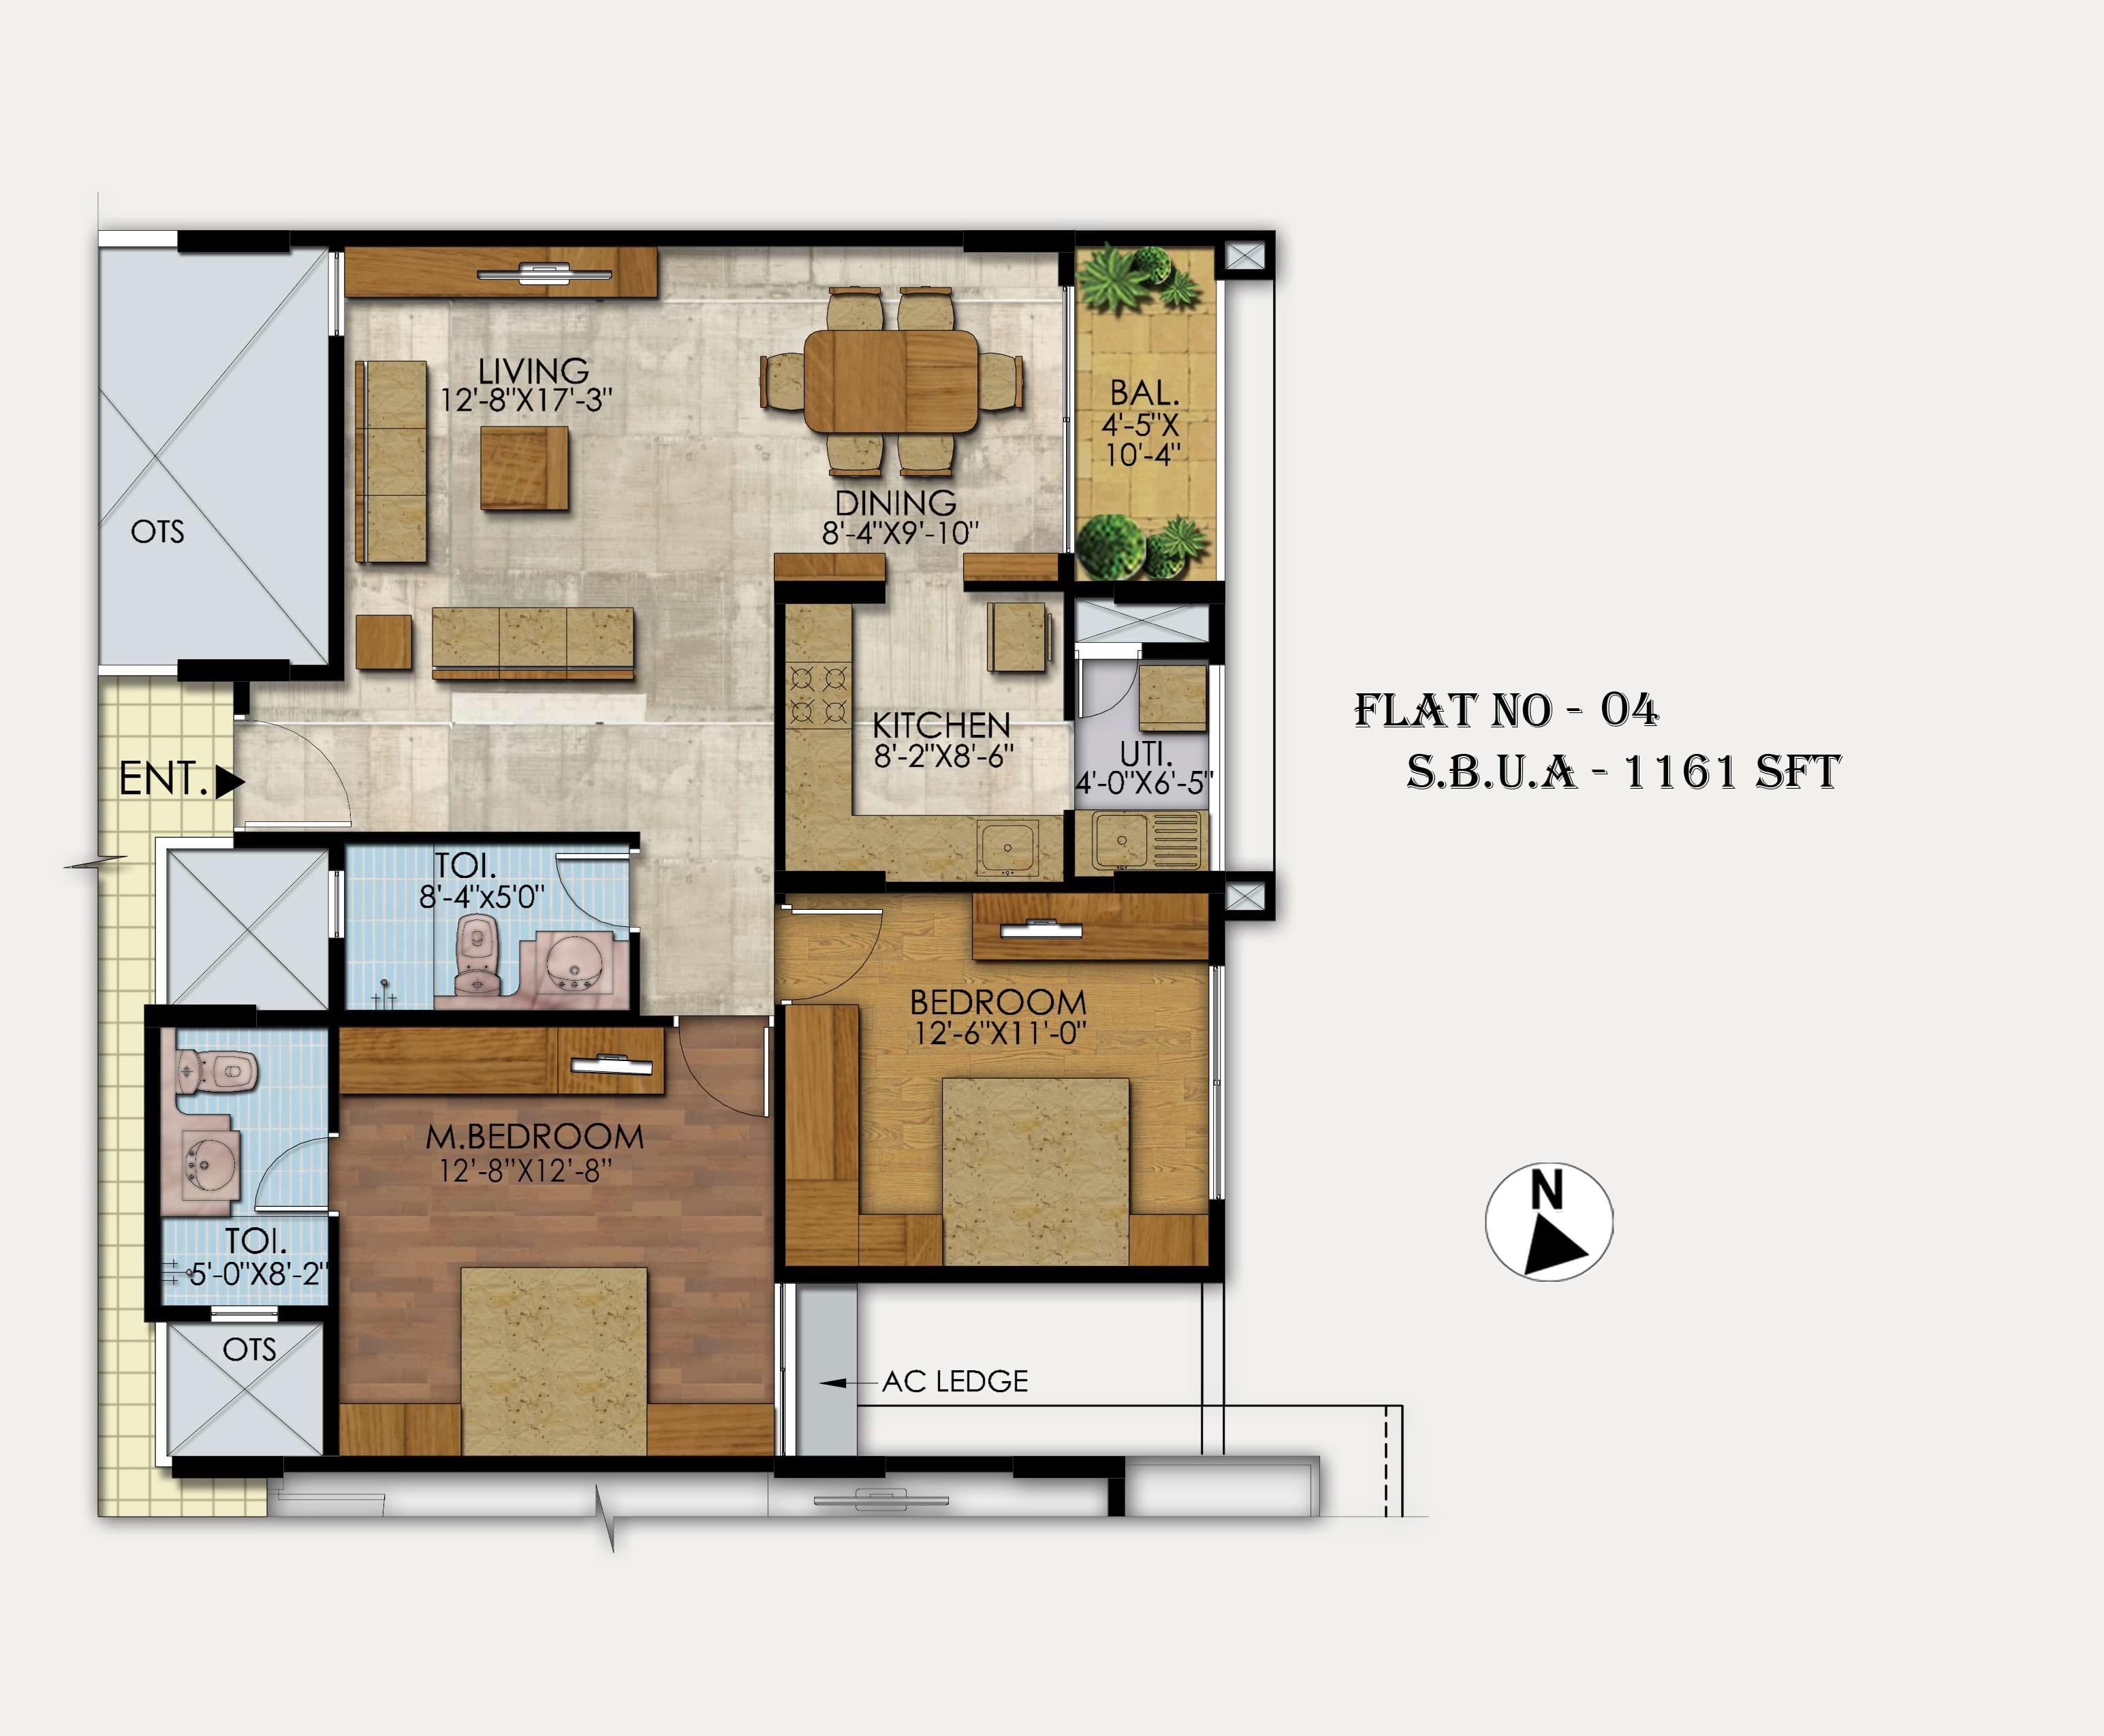 Mahaveer-Ranches-2bhk-1161-sqft-floorplan